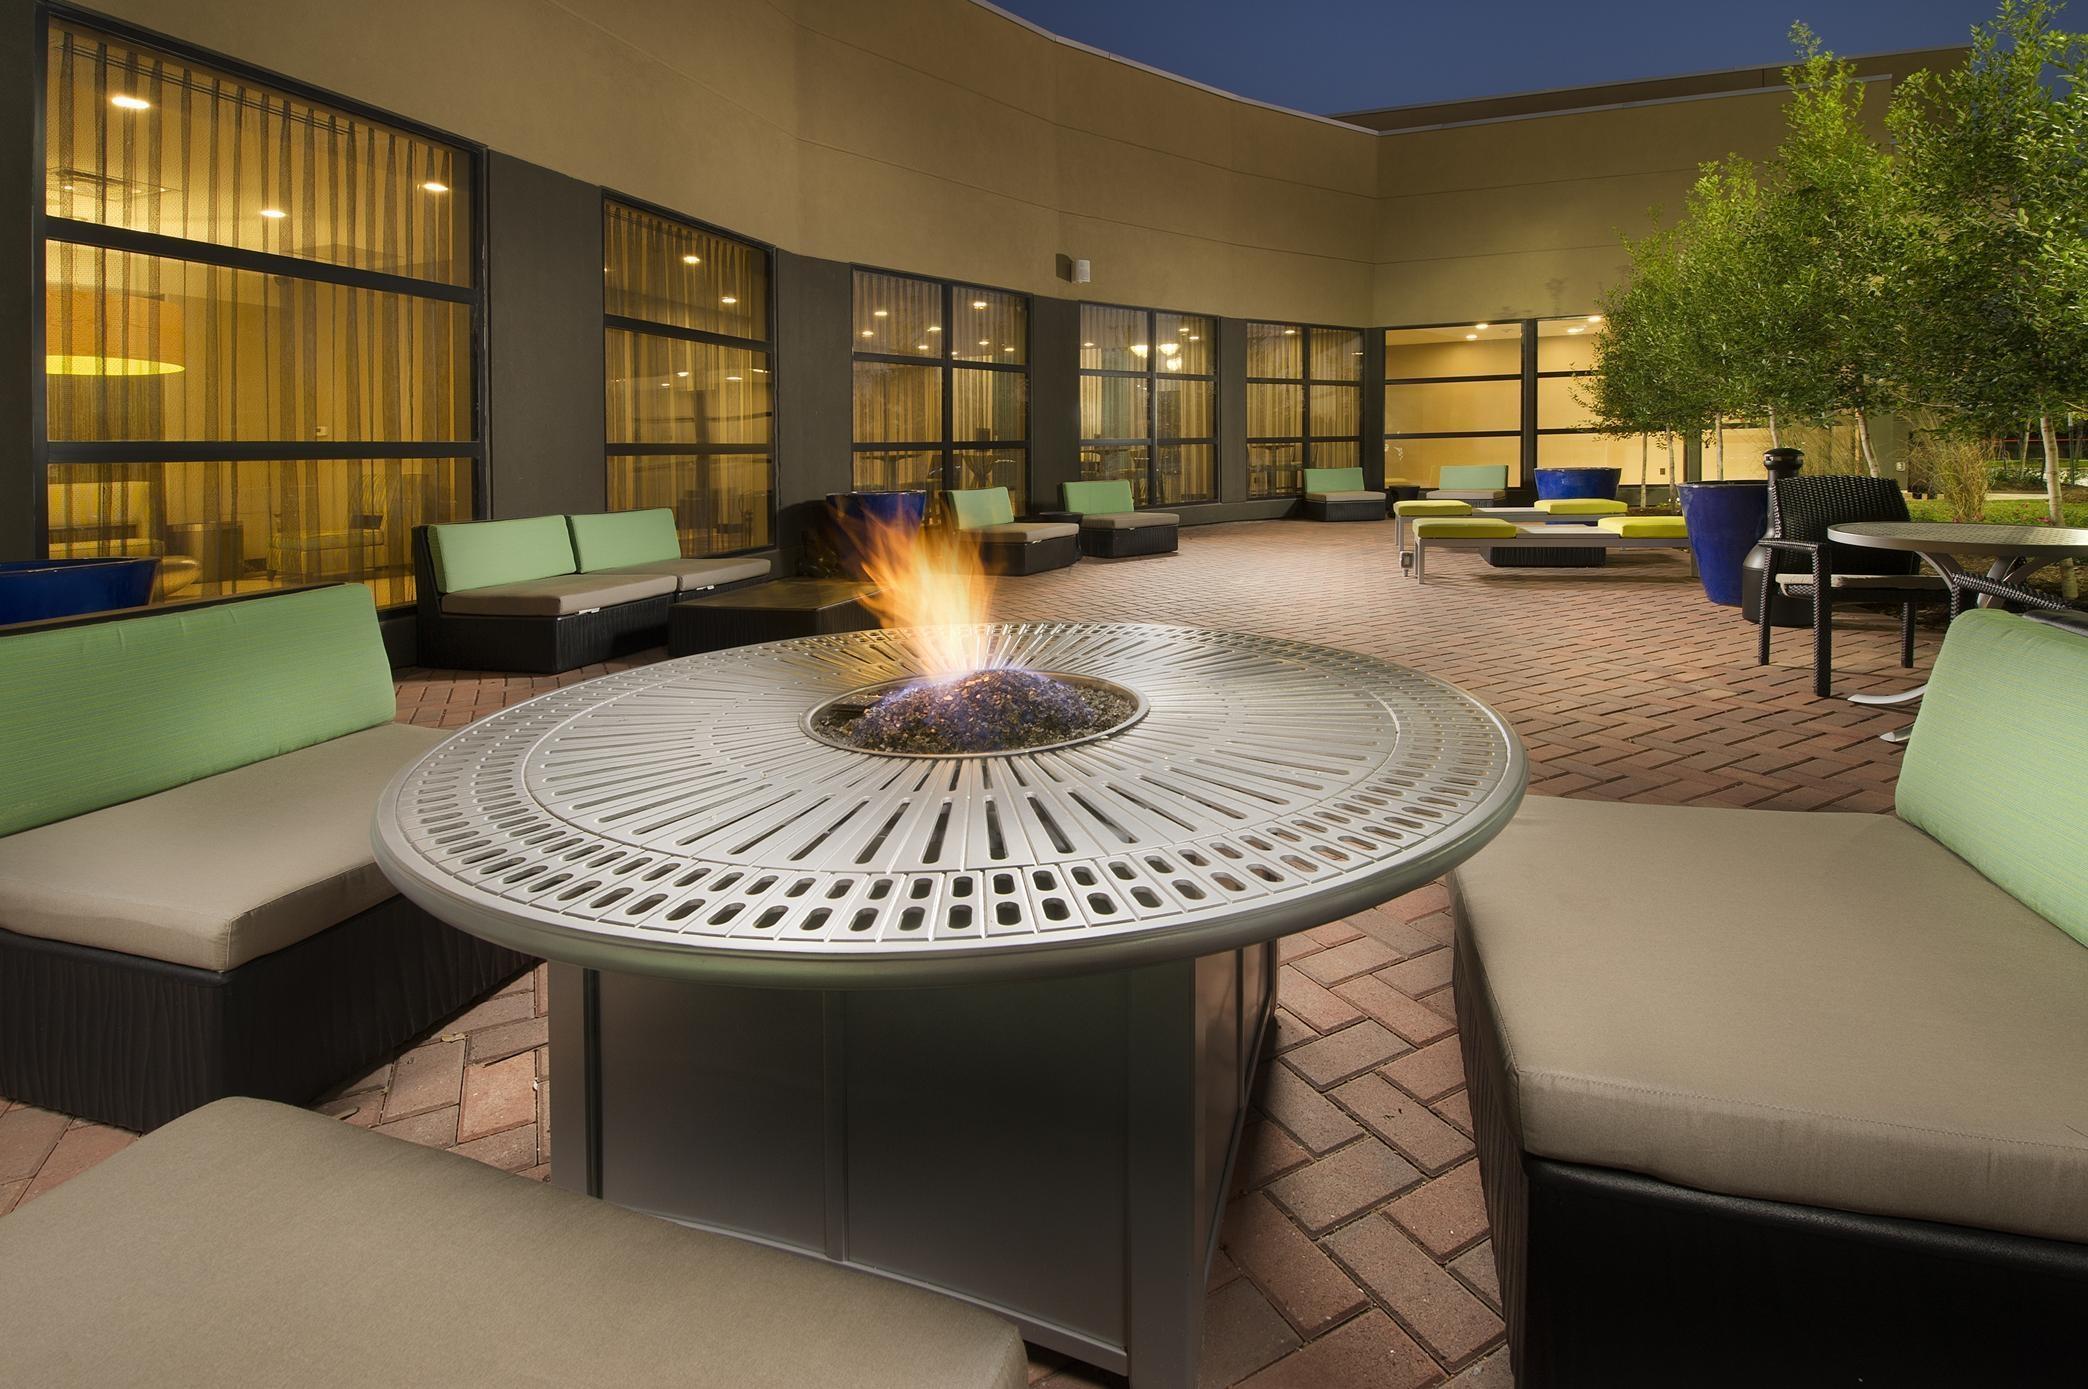 Hilton Garden Inn College Station image 27